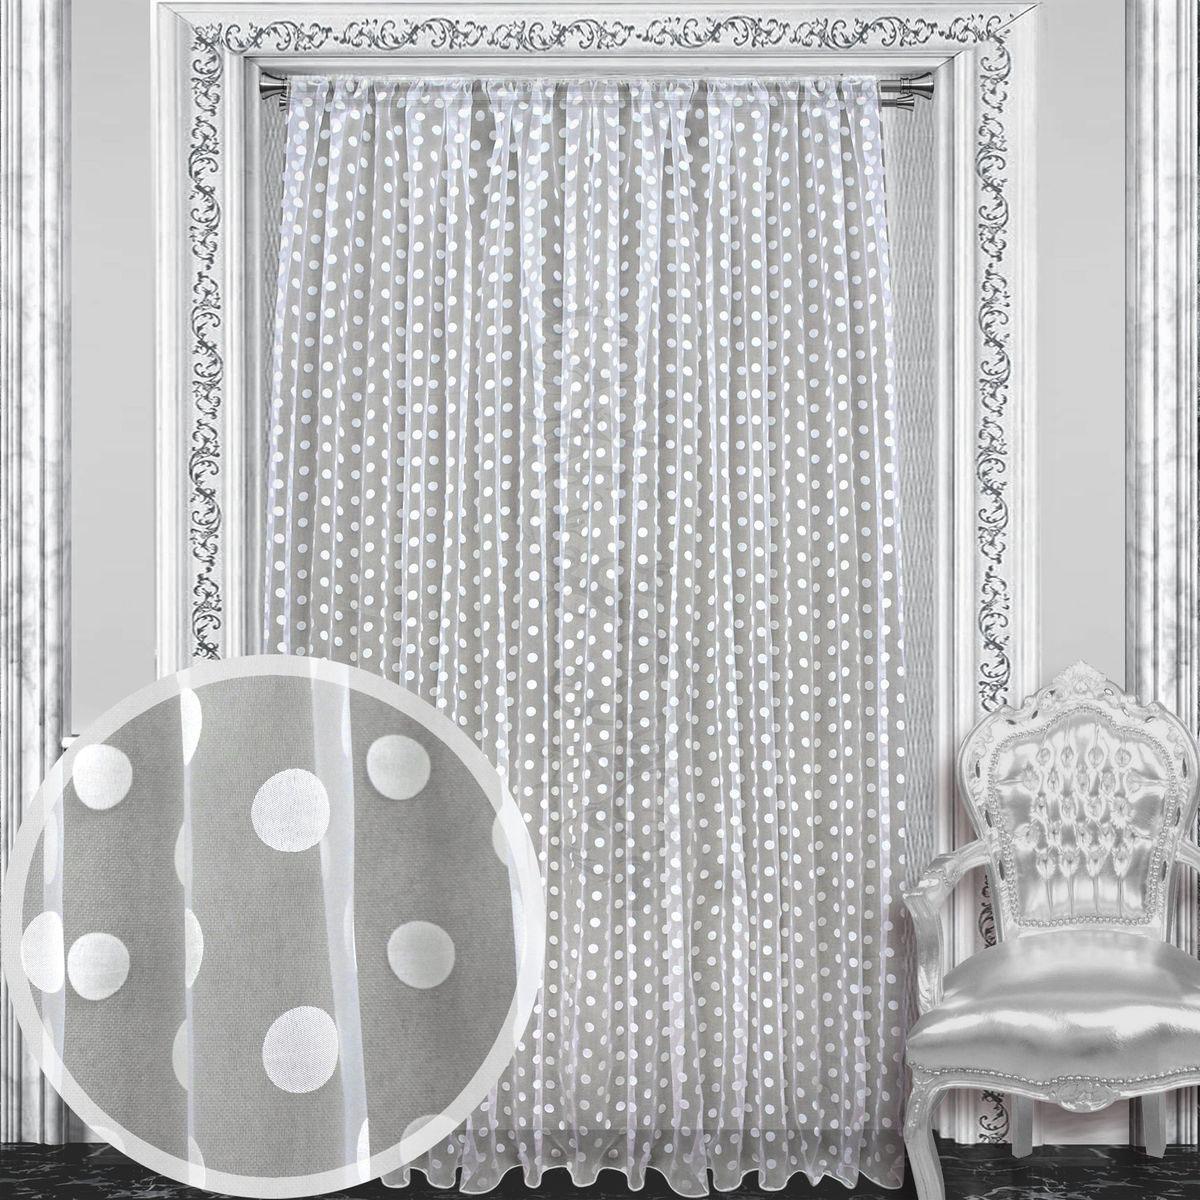 Тюль Amore Mio, 300 х 270 см, 1 шт., цвет: белый. 8611786117